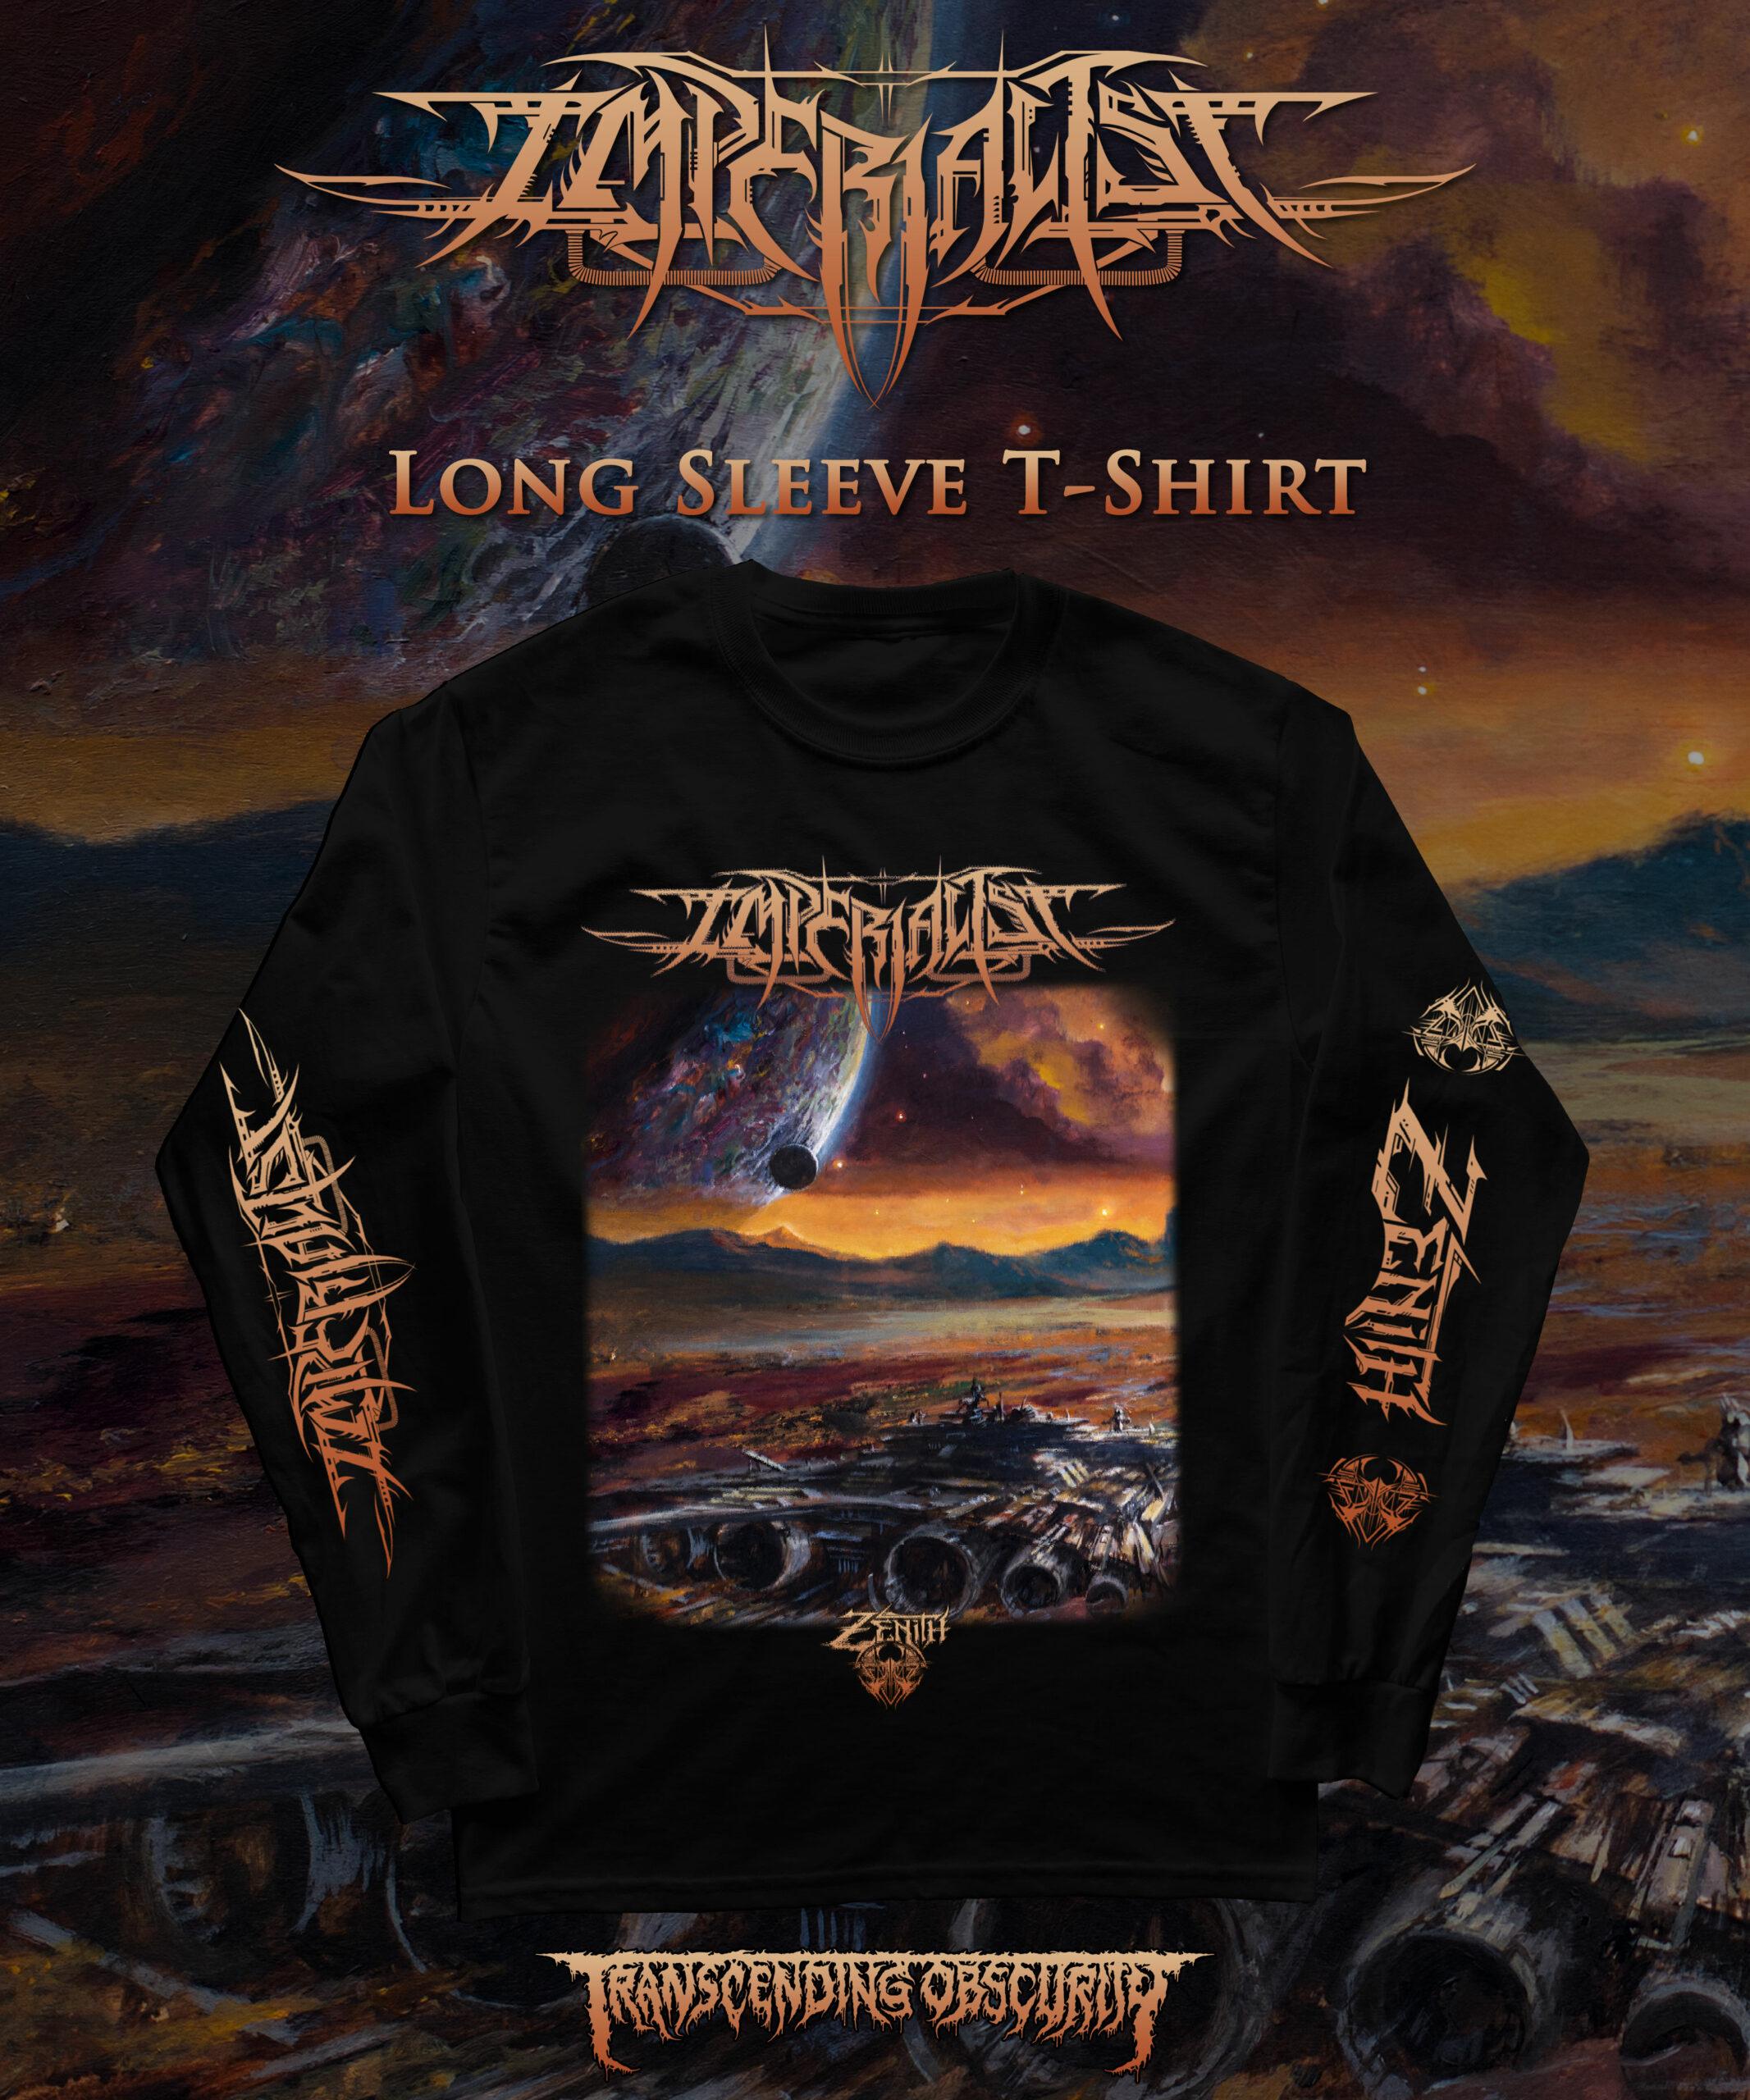 IMPERIALIST - Zenith Album Artwork Long Sleeve T-shirt Variant #2 (Spaceship)